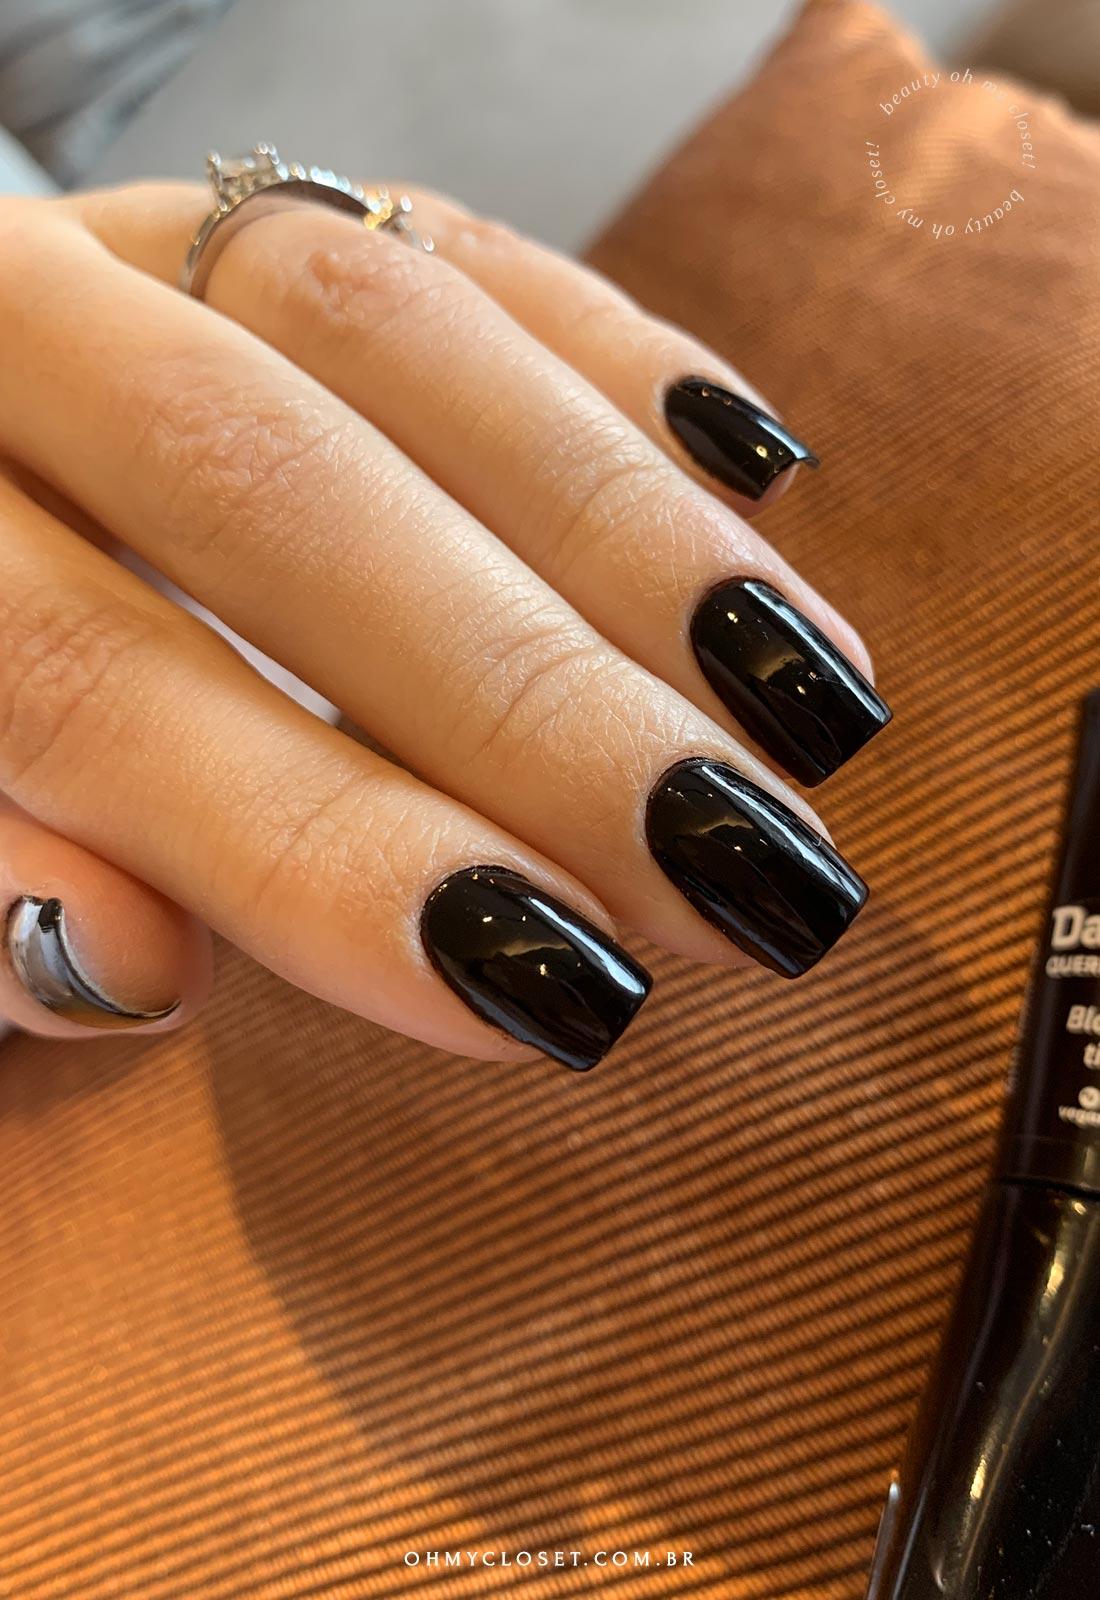 Outro ângulo esmalte preto Dailus Black Tie.